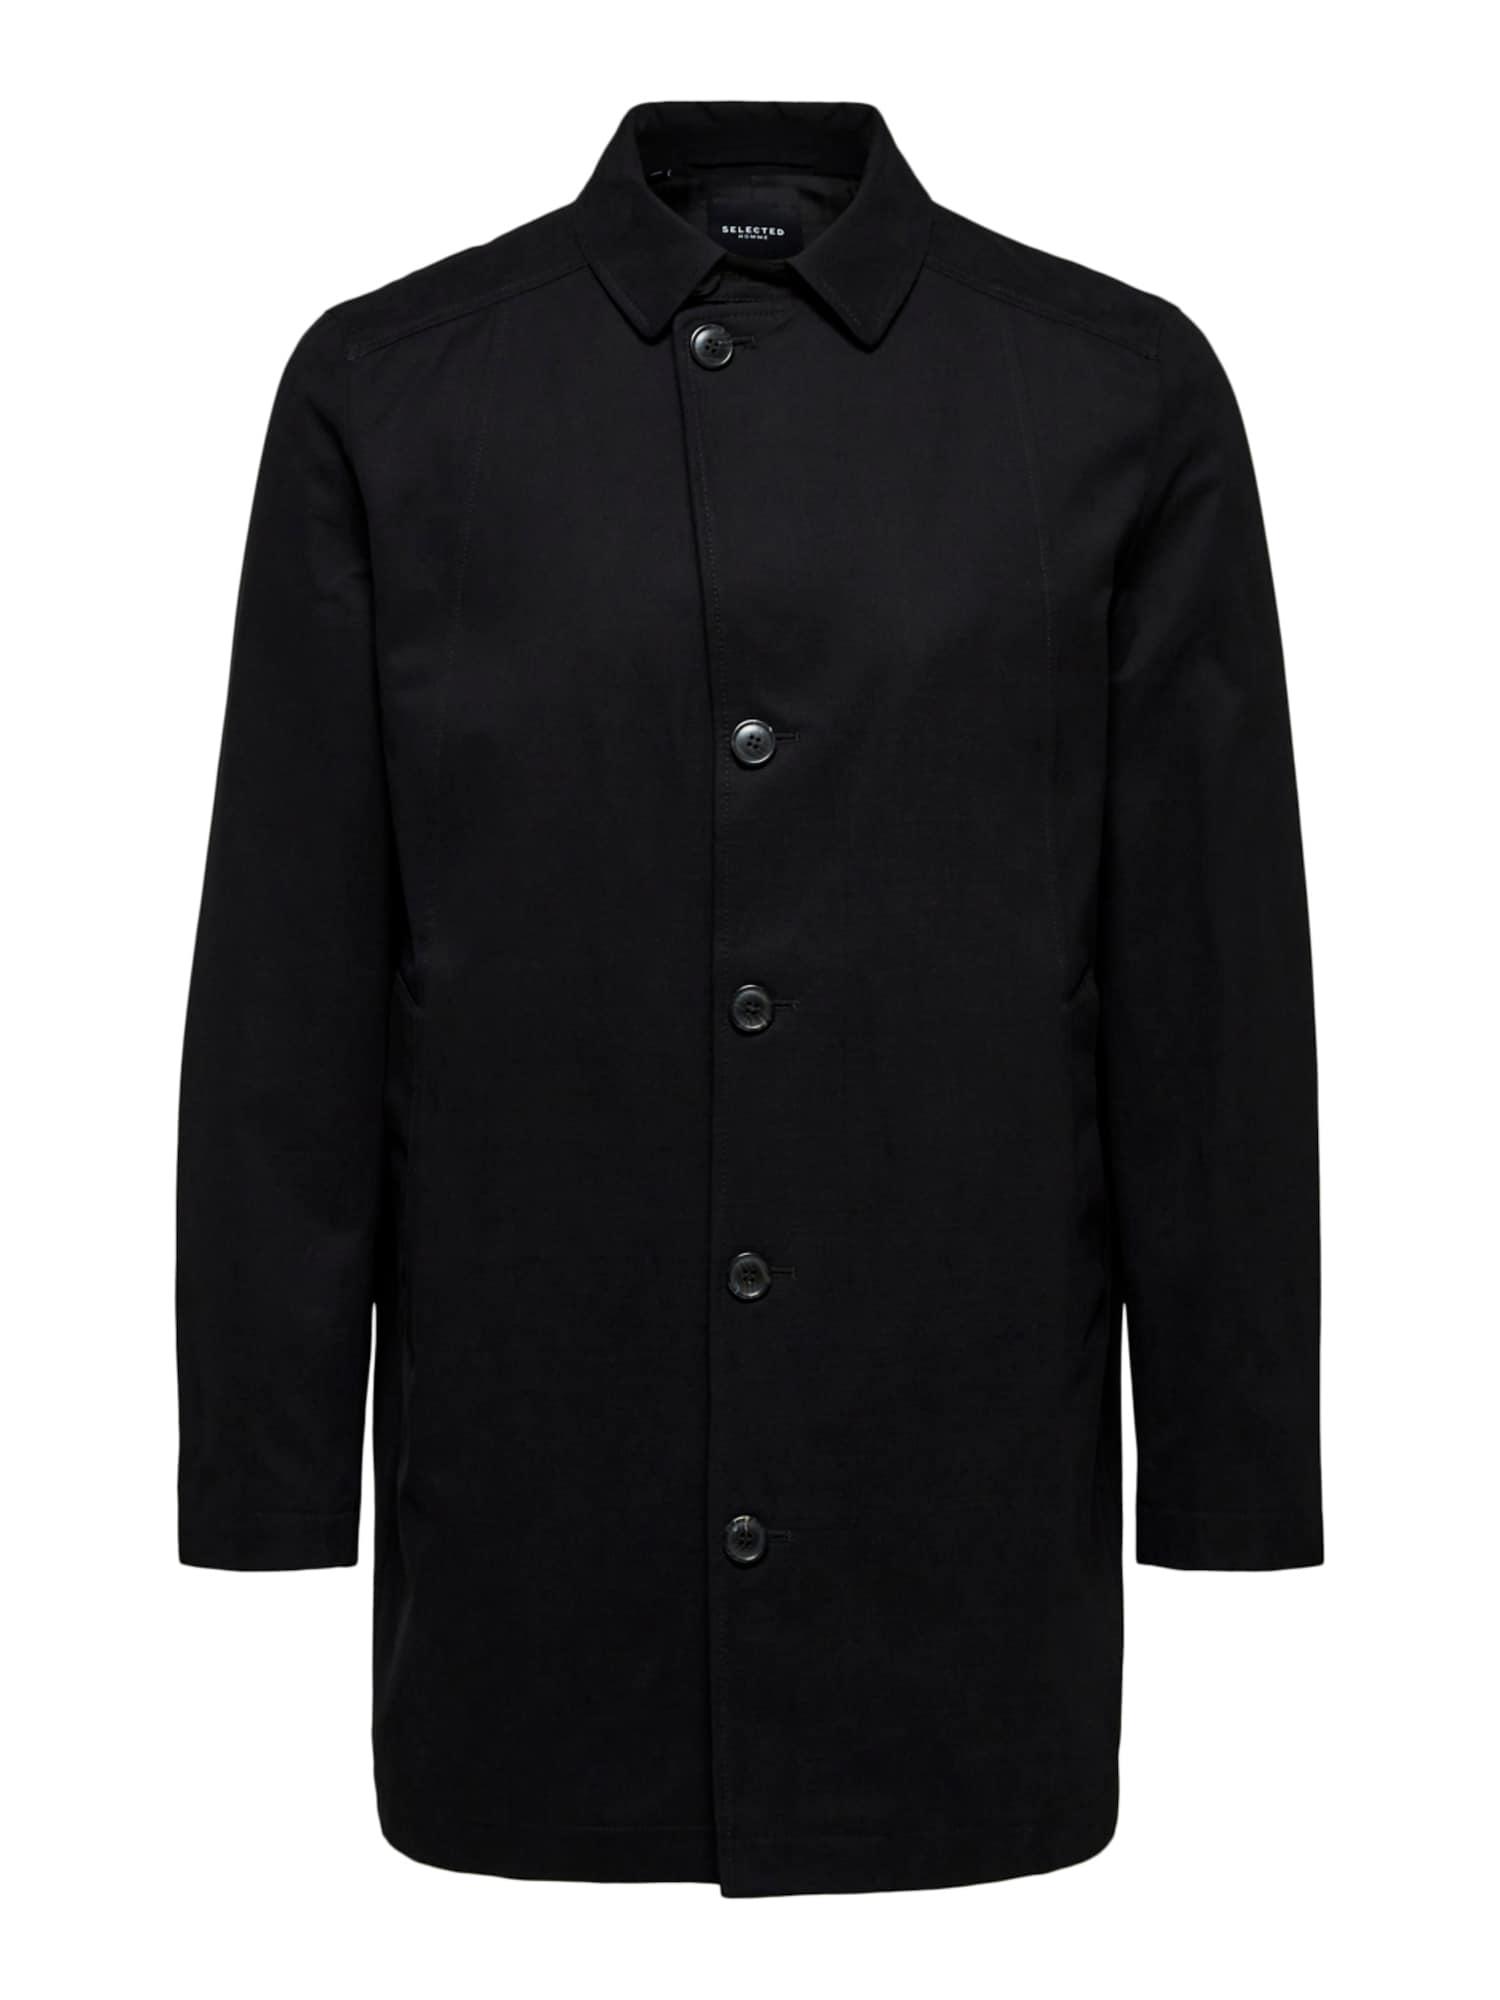 SELECTED HOMME Demisezoninis paltas juoda